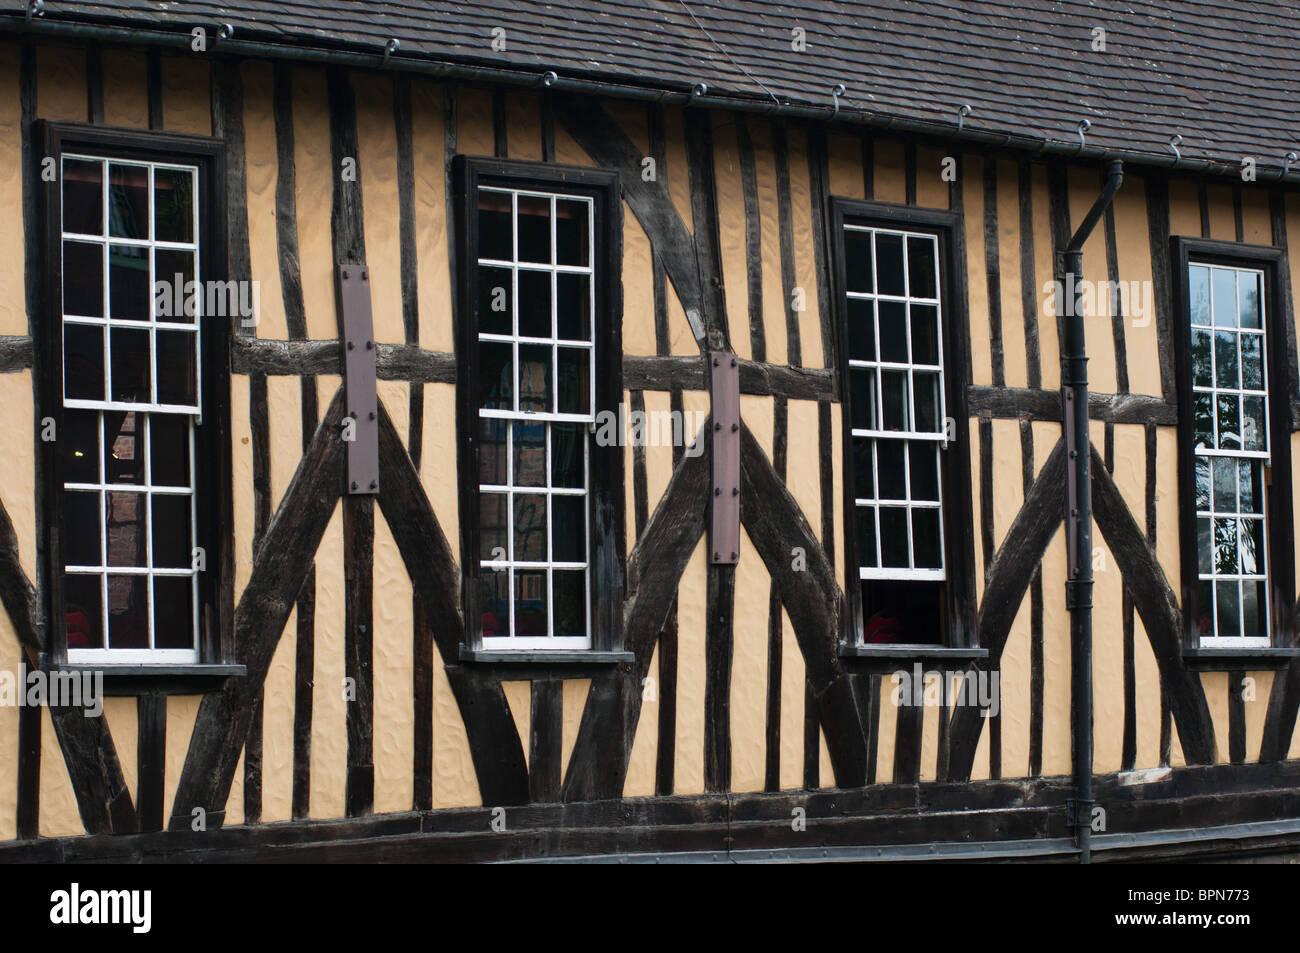 Merchant Adventurers Hall York England - Stock Image